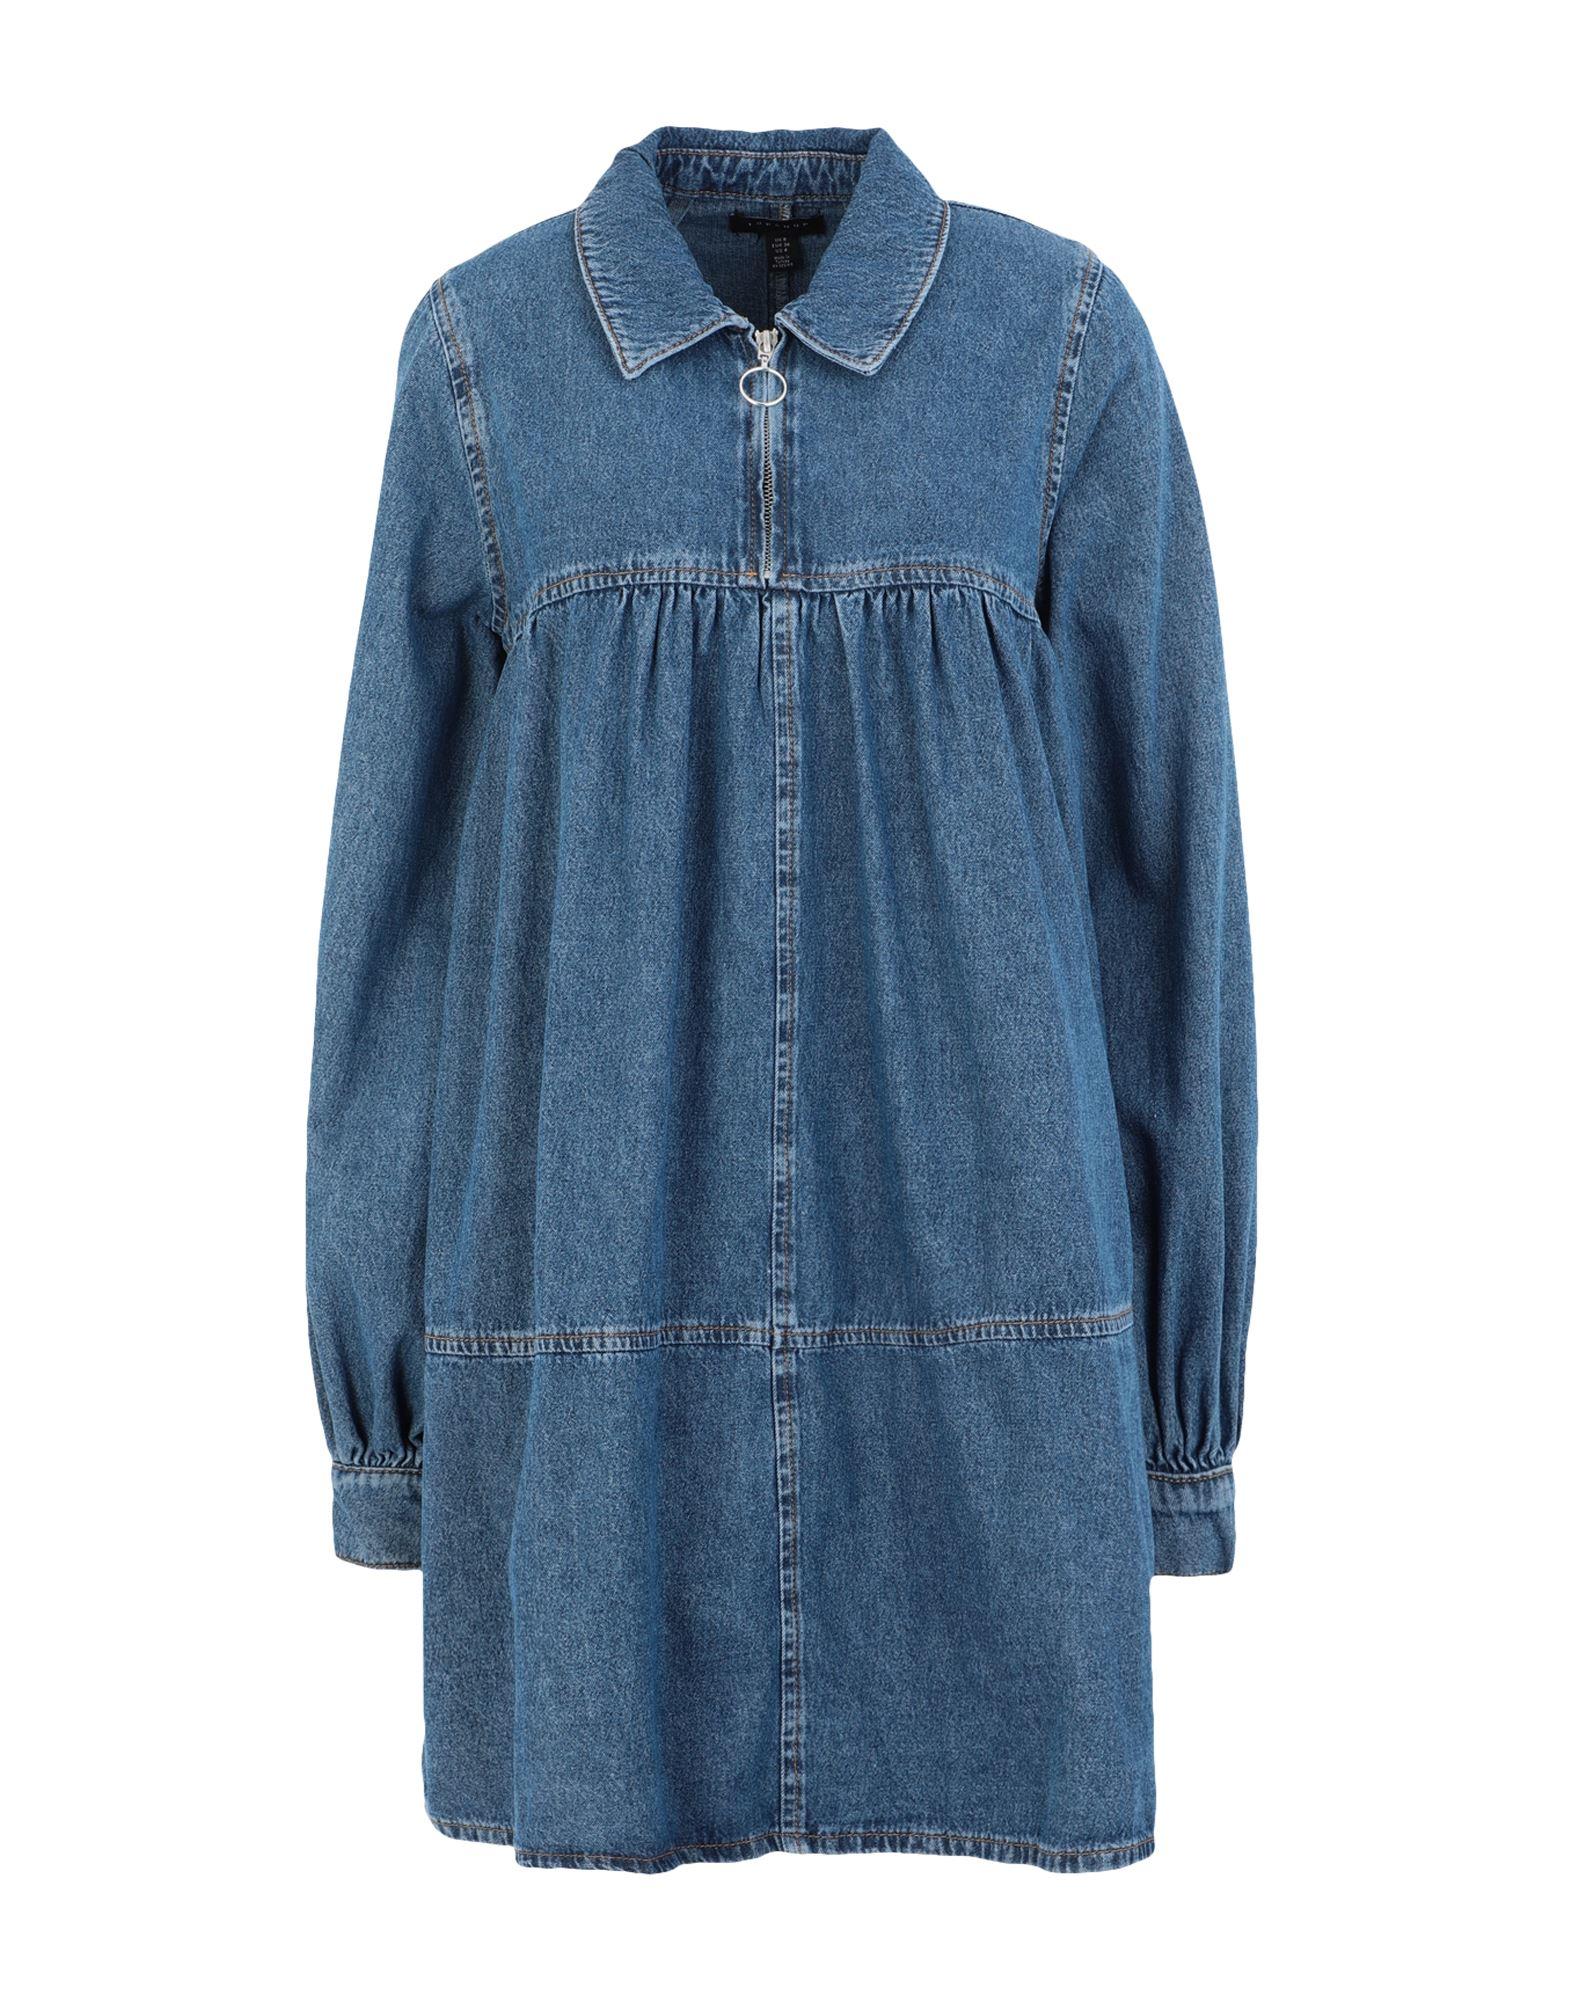 TOPSHOP トップショップ レディース ミニワンピース&ドレス MID BLUE BABYDOLL DRESS ブルー